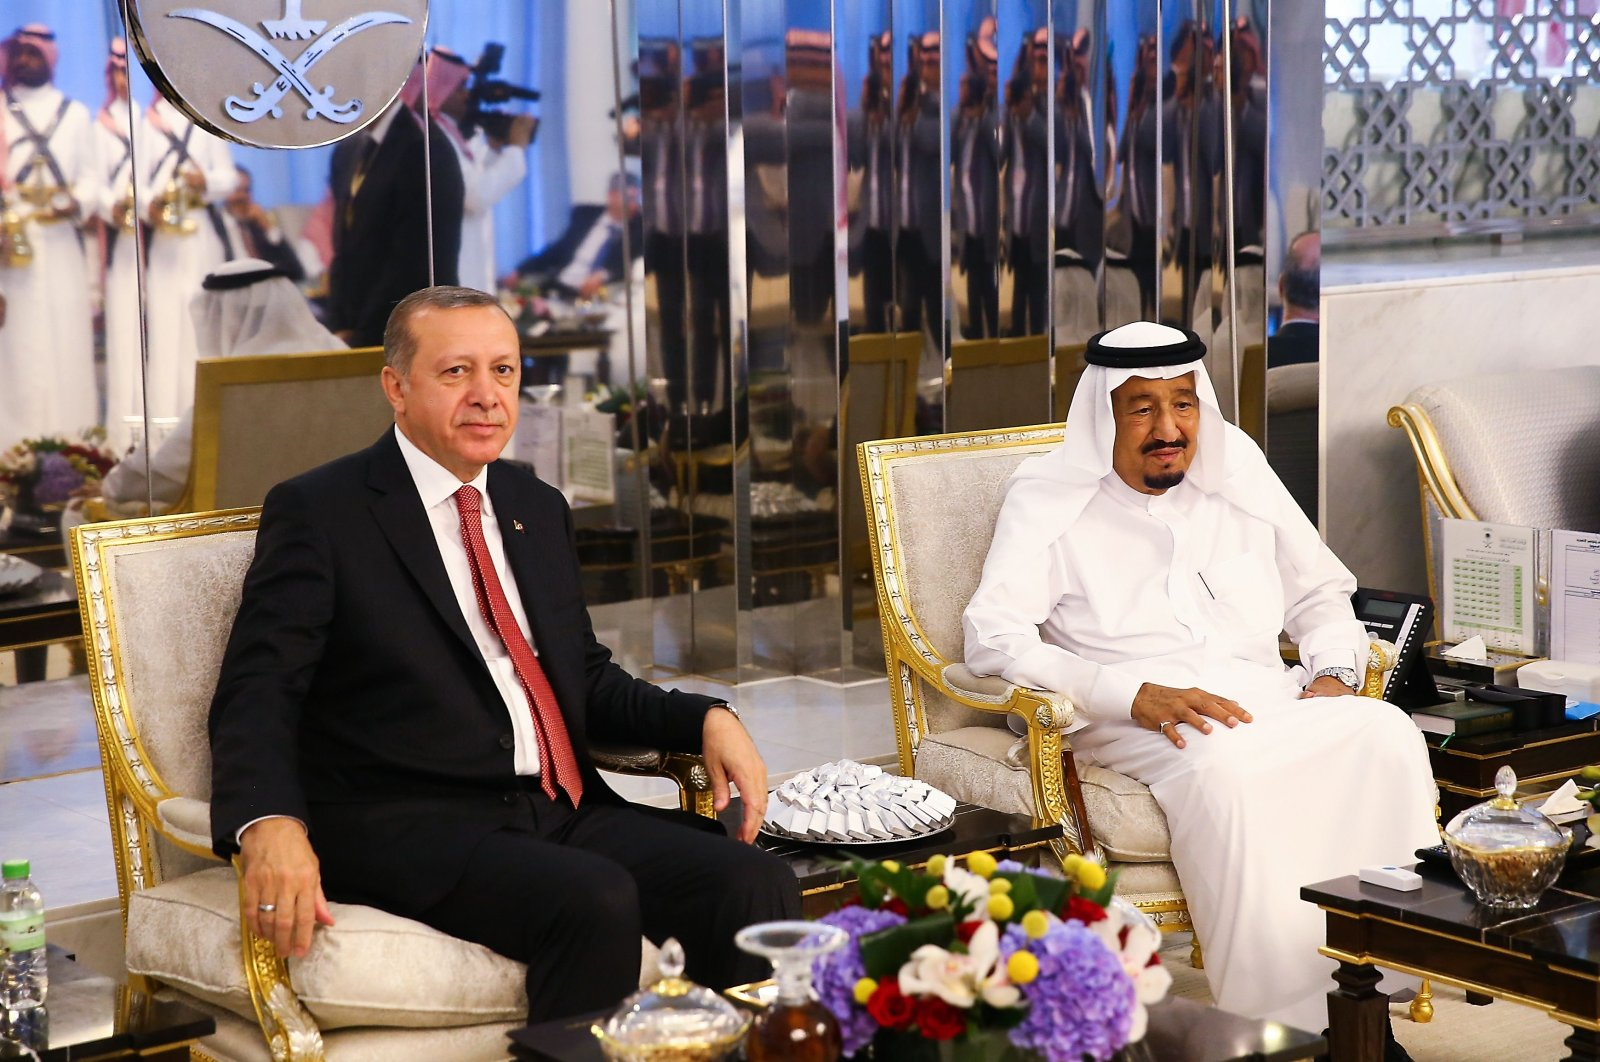 Turkish President Recep Tayyip Erdoğan (L) meeting with Saudi Arabia's King Salman bin Abdulaziz Al Saud during an official visit in Jeddah, Saudi Arabia, July 23, 2017. (AFP Photo)